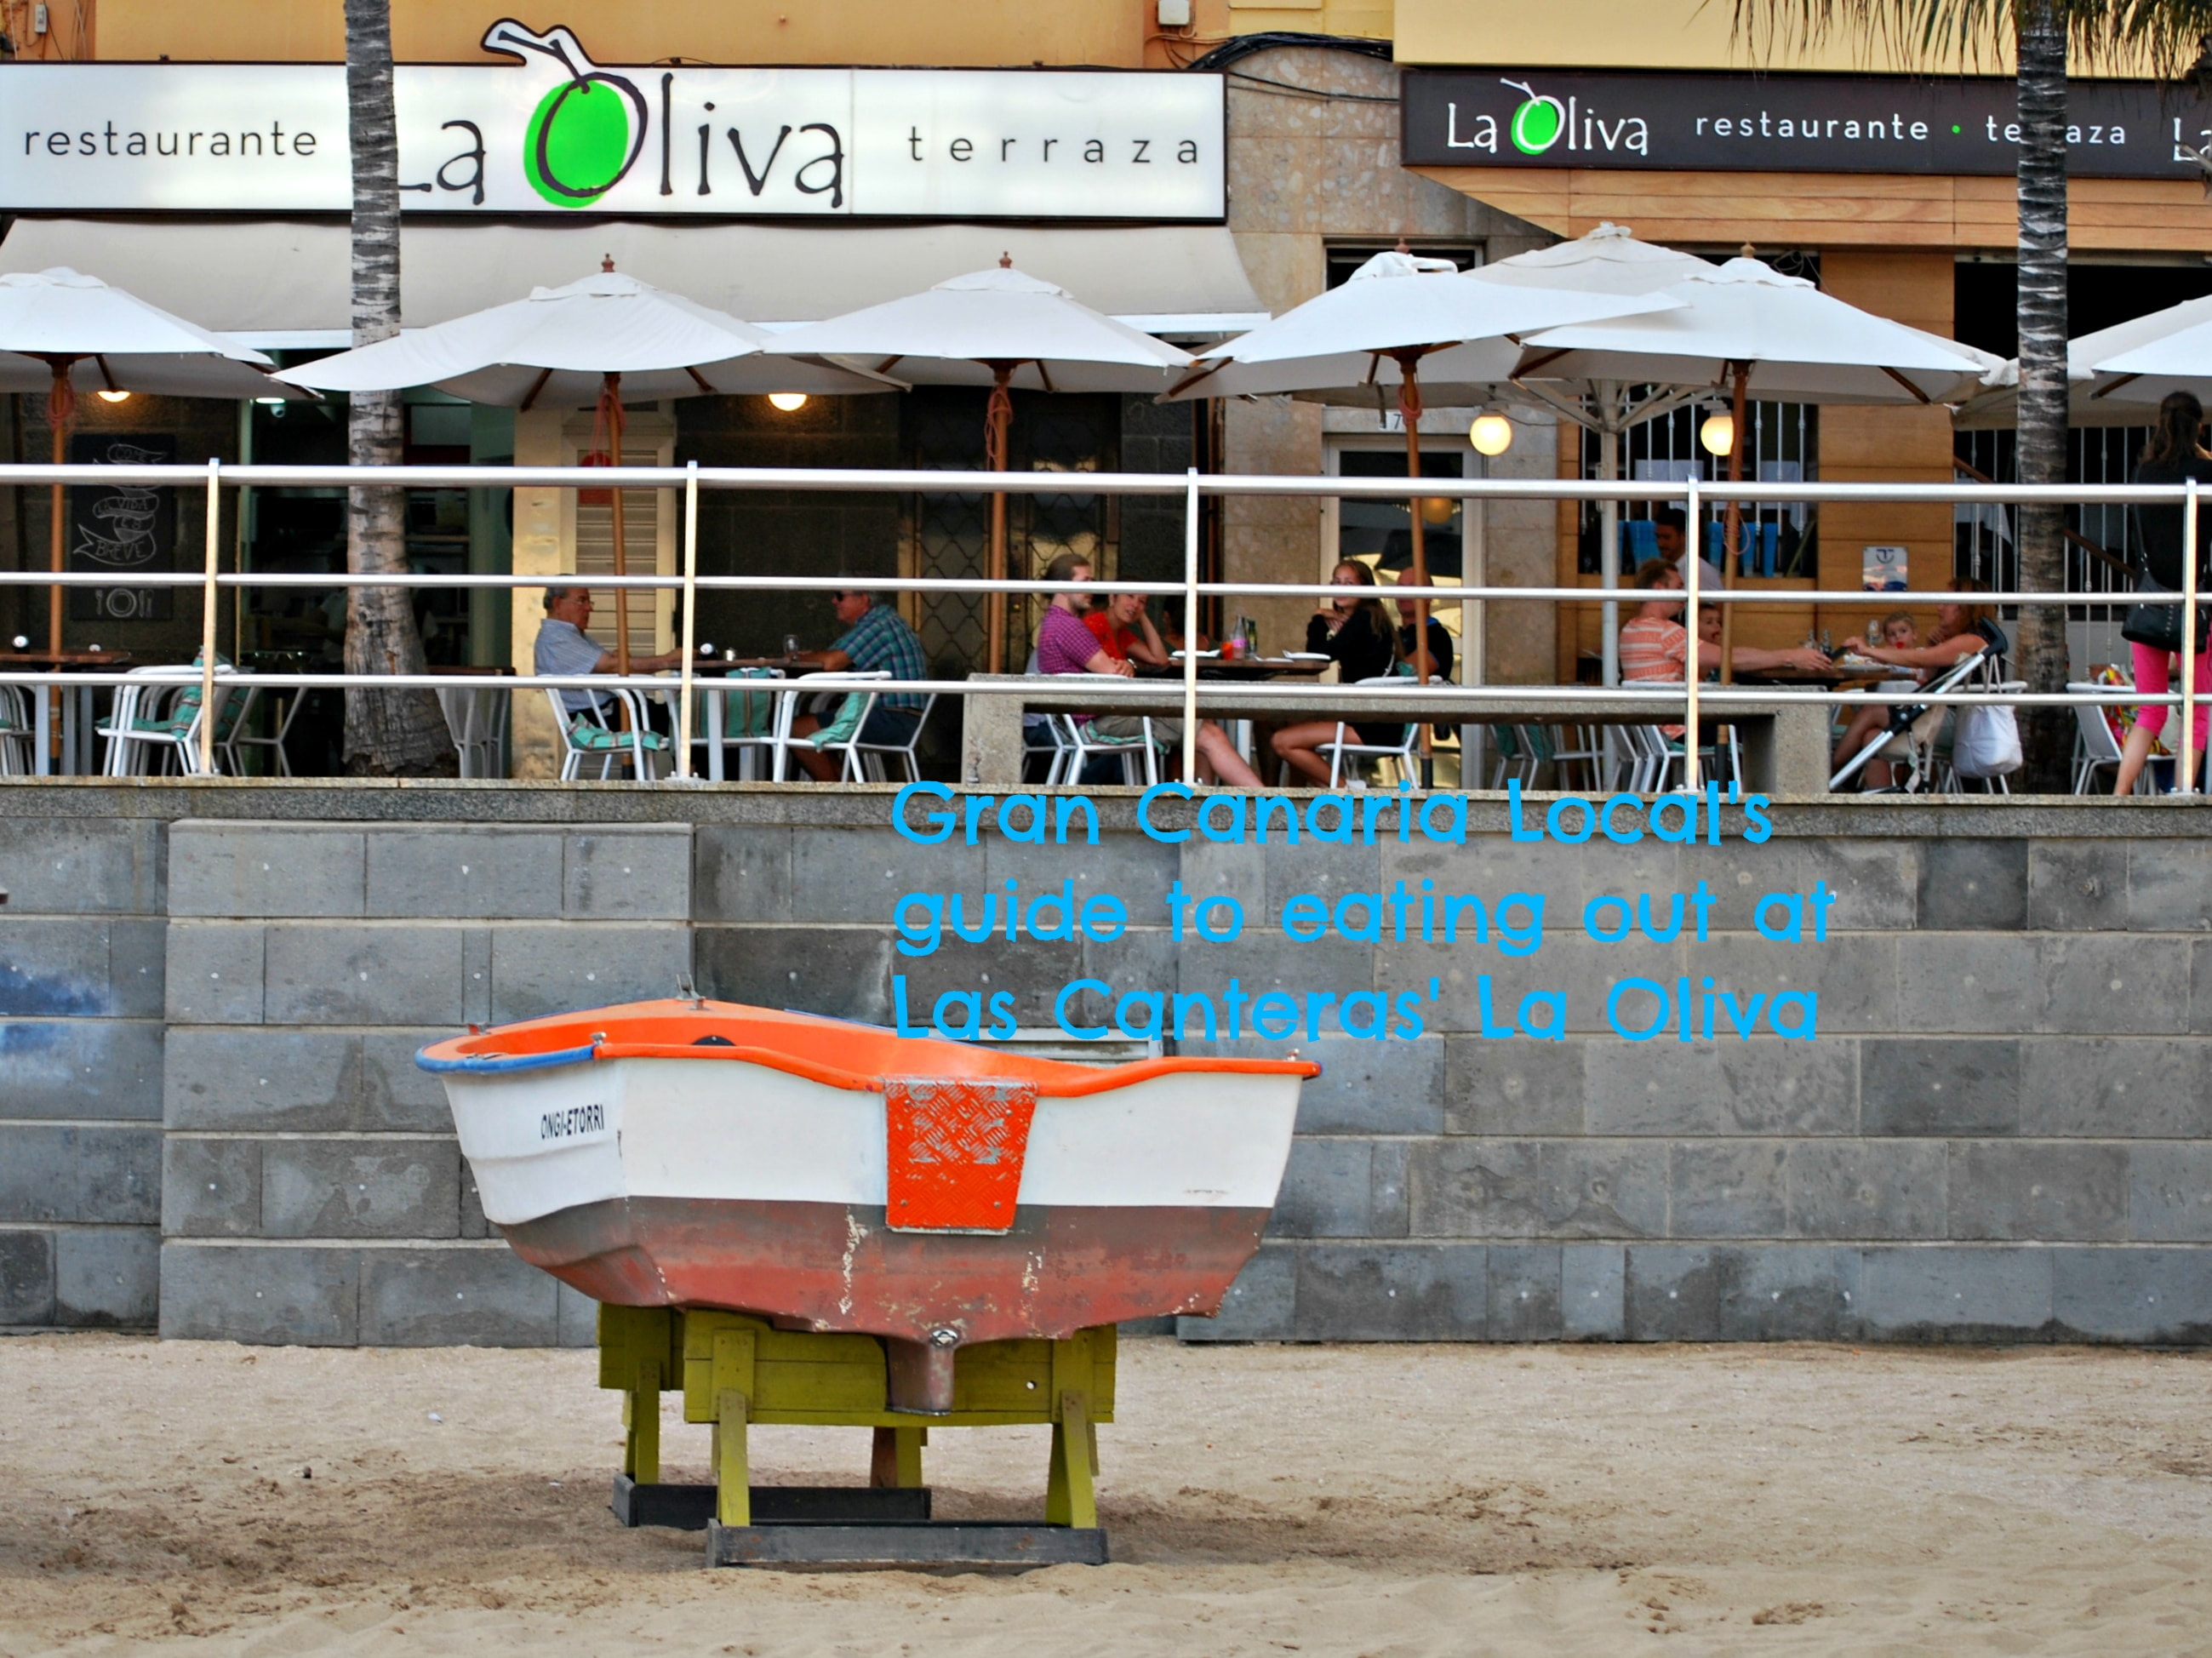 La Oliva restaurante, our latest recommended restaurant